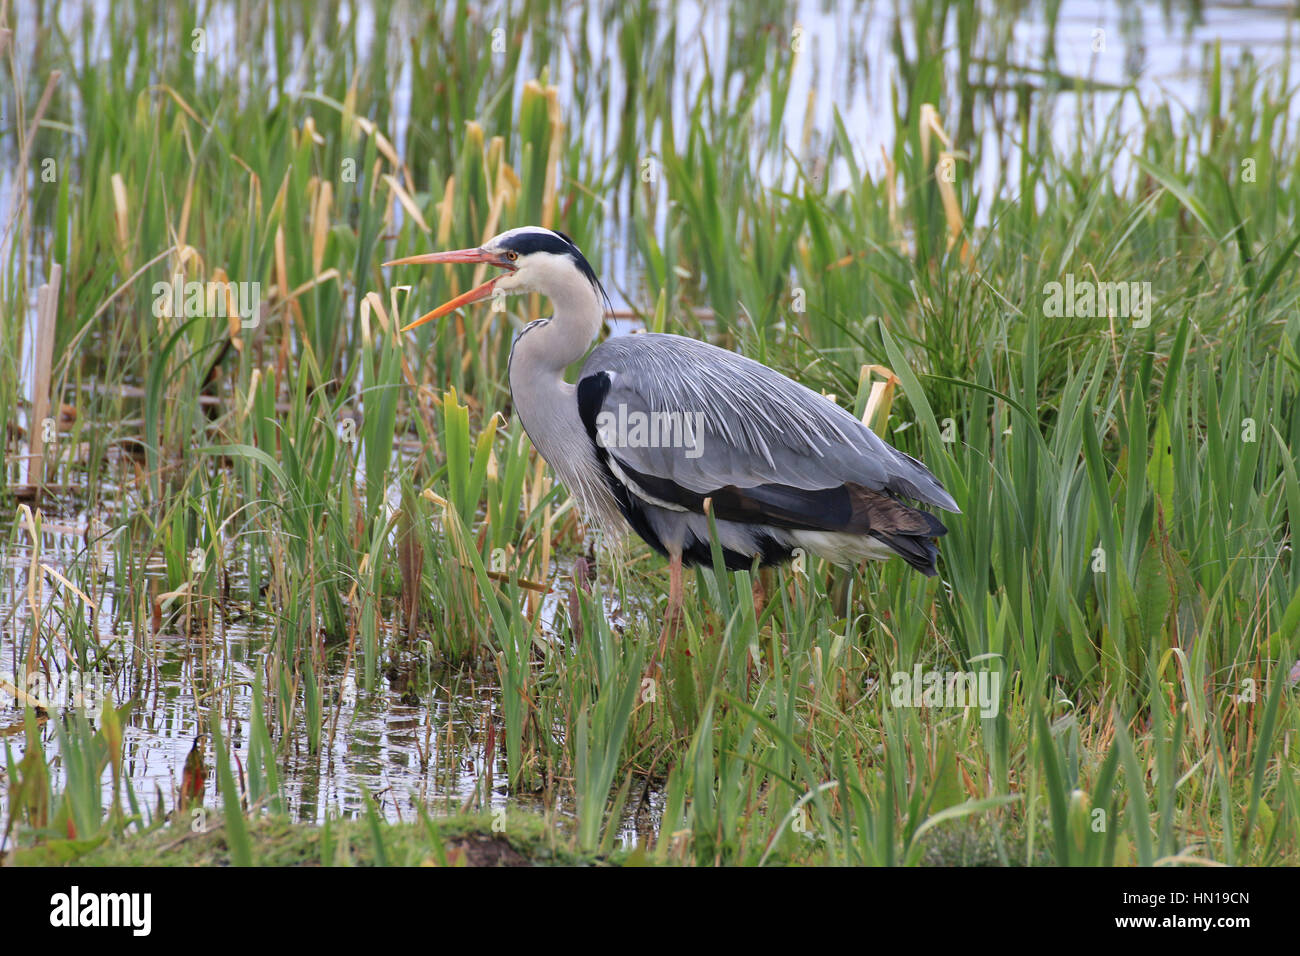 Grey heron In marsh with beak open - Stock Image